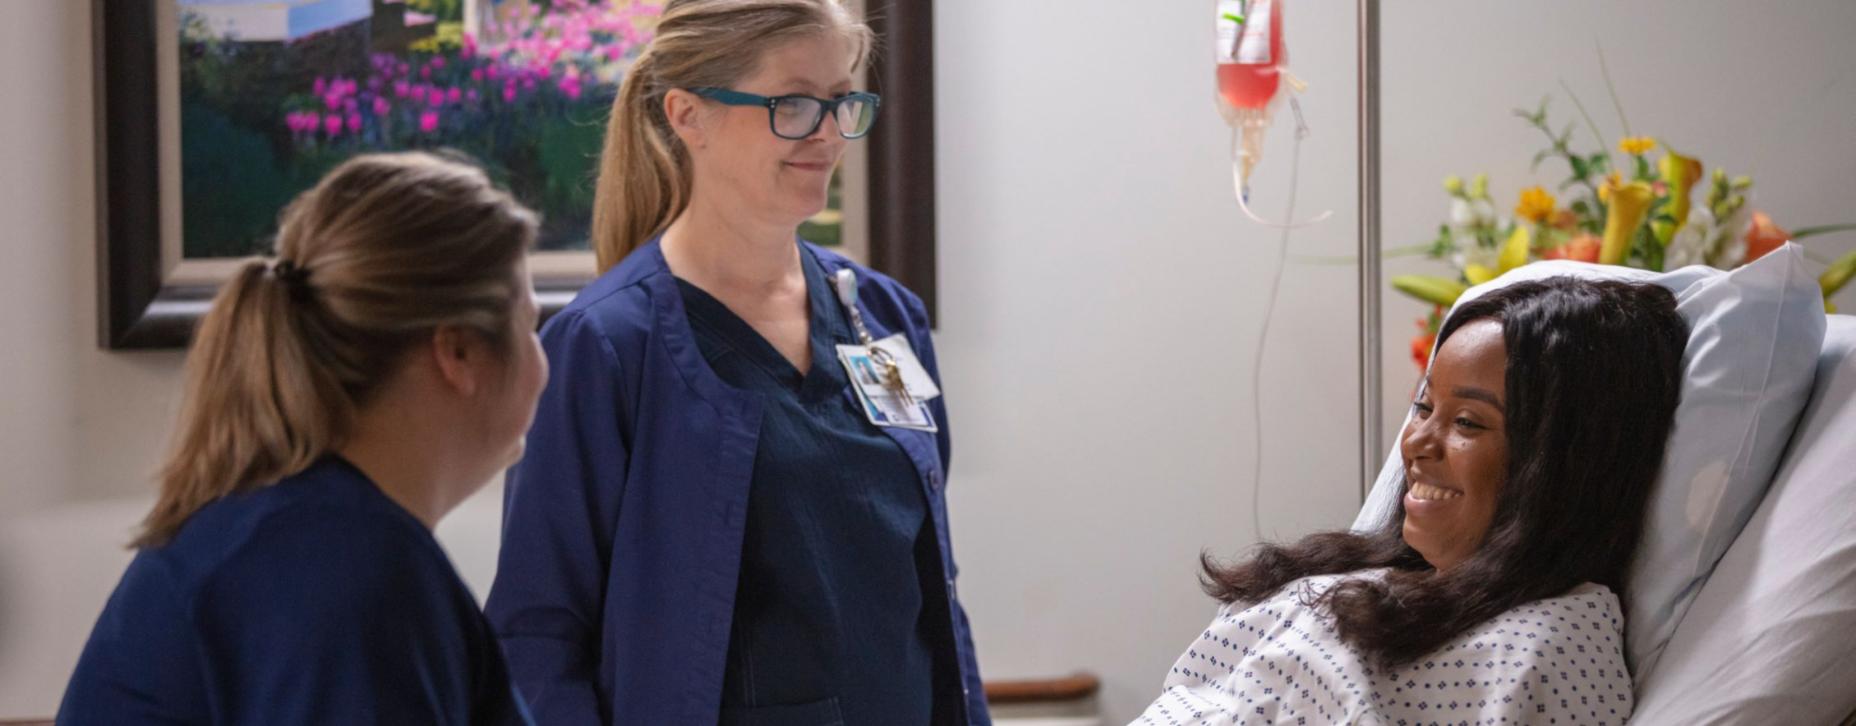 nurses around patient